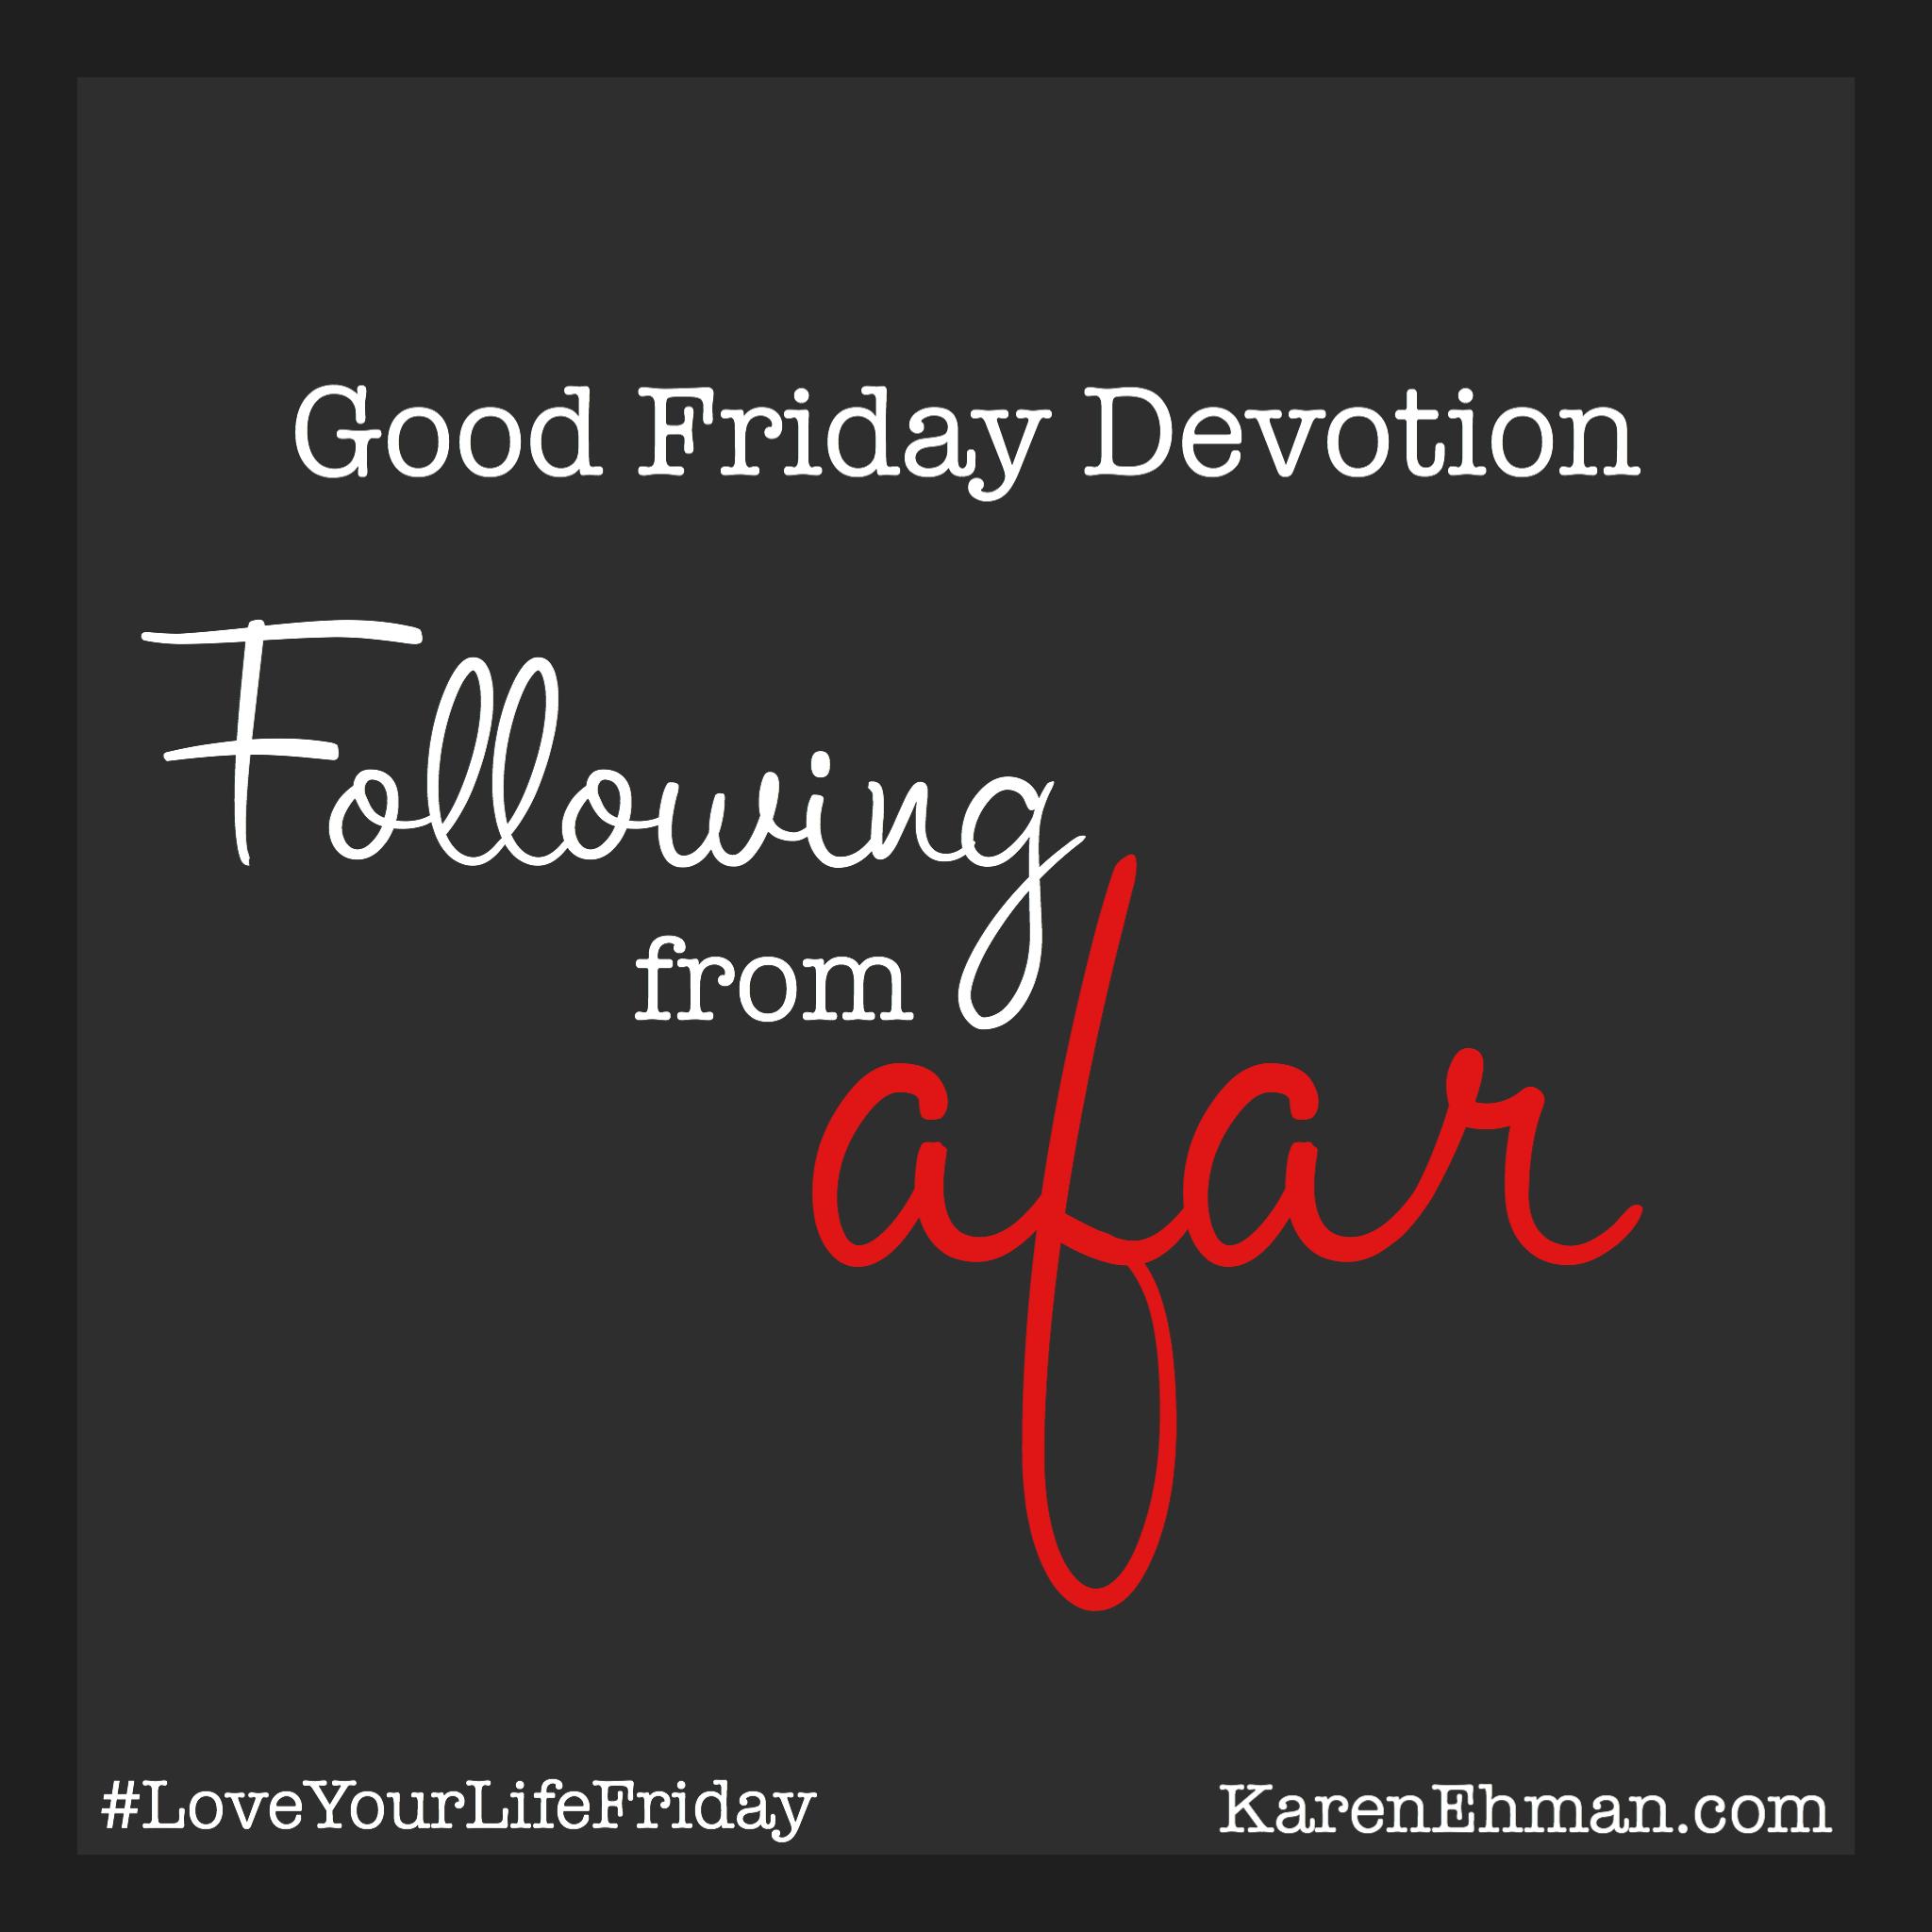 Good Friday Devotion: Following from Afar at KarenEhman.com. Mark 14:54-55